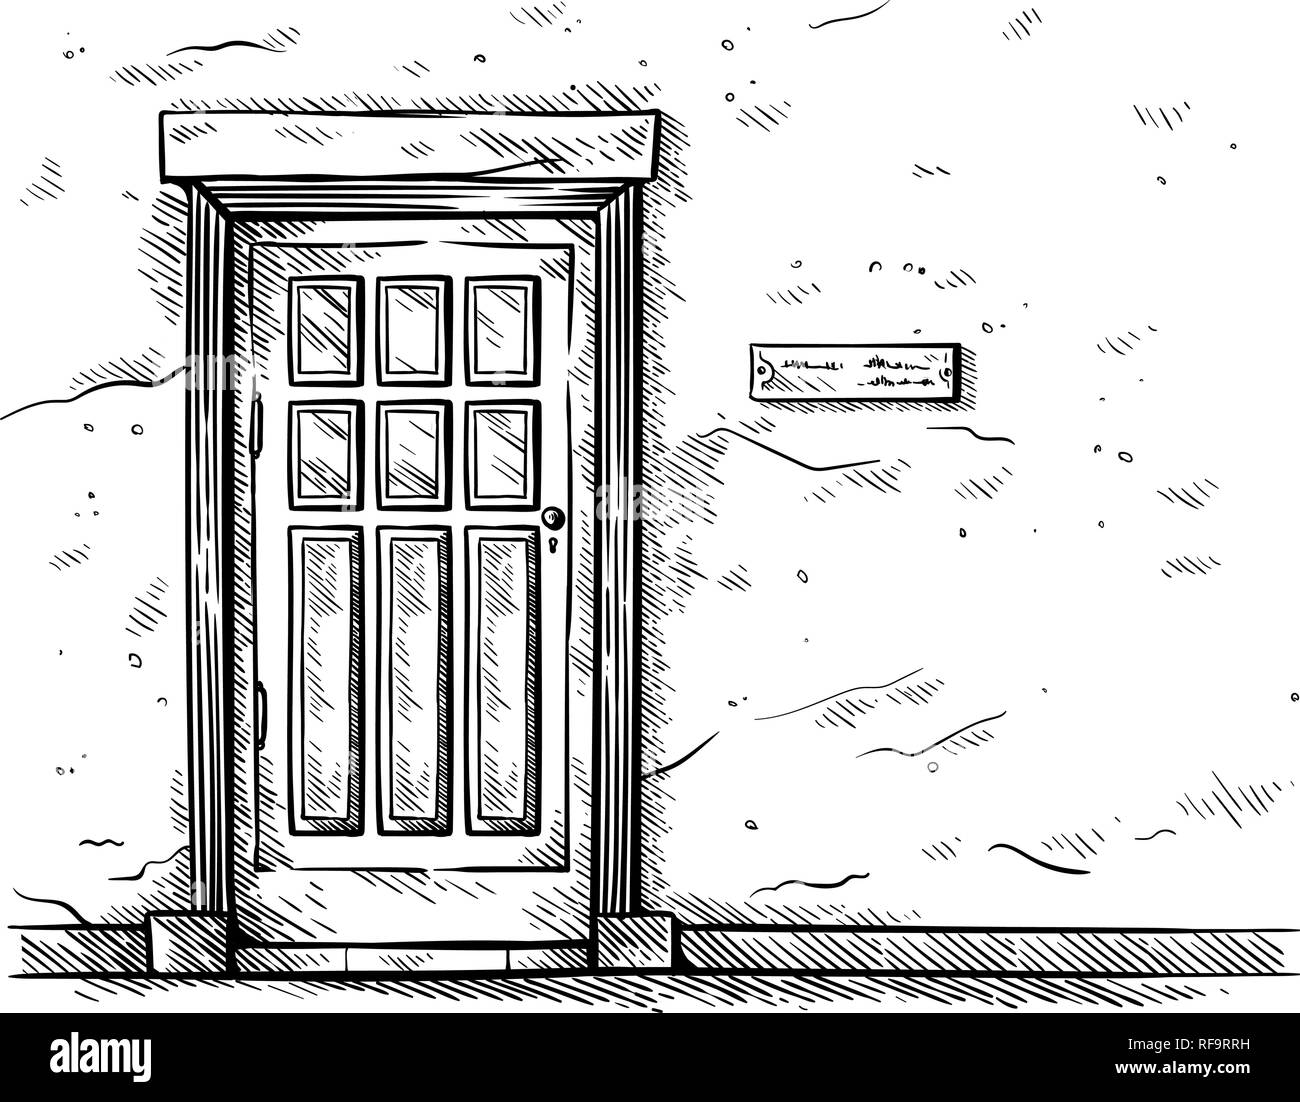 sketch hand drawn old rectangular wooden door in brick wall vector illustraion - Stock Image